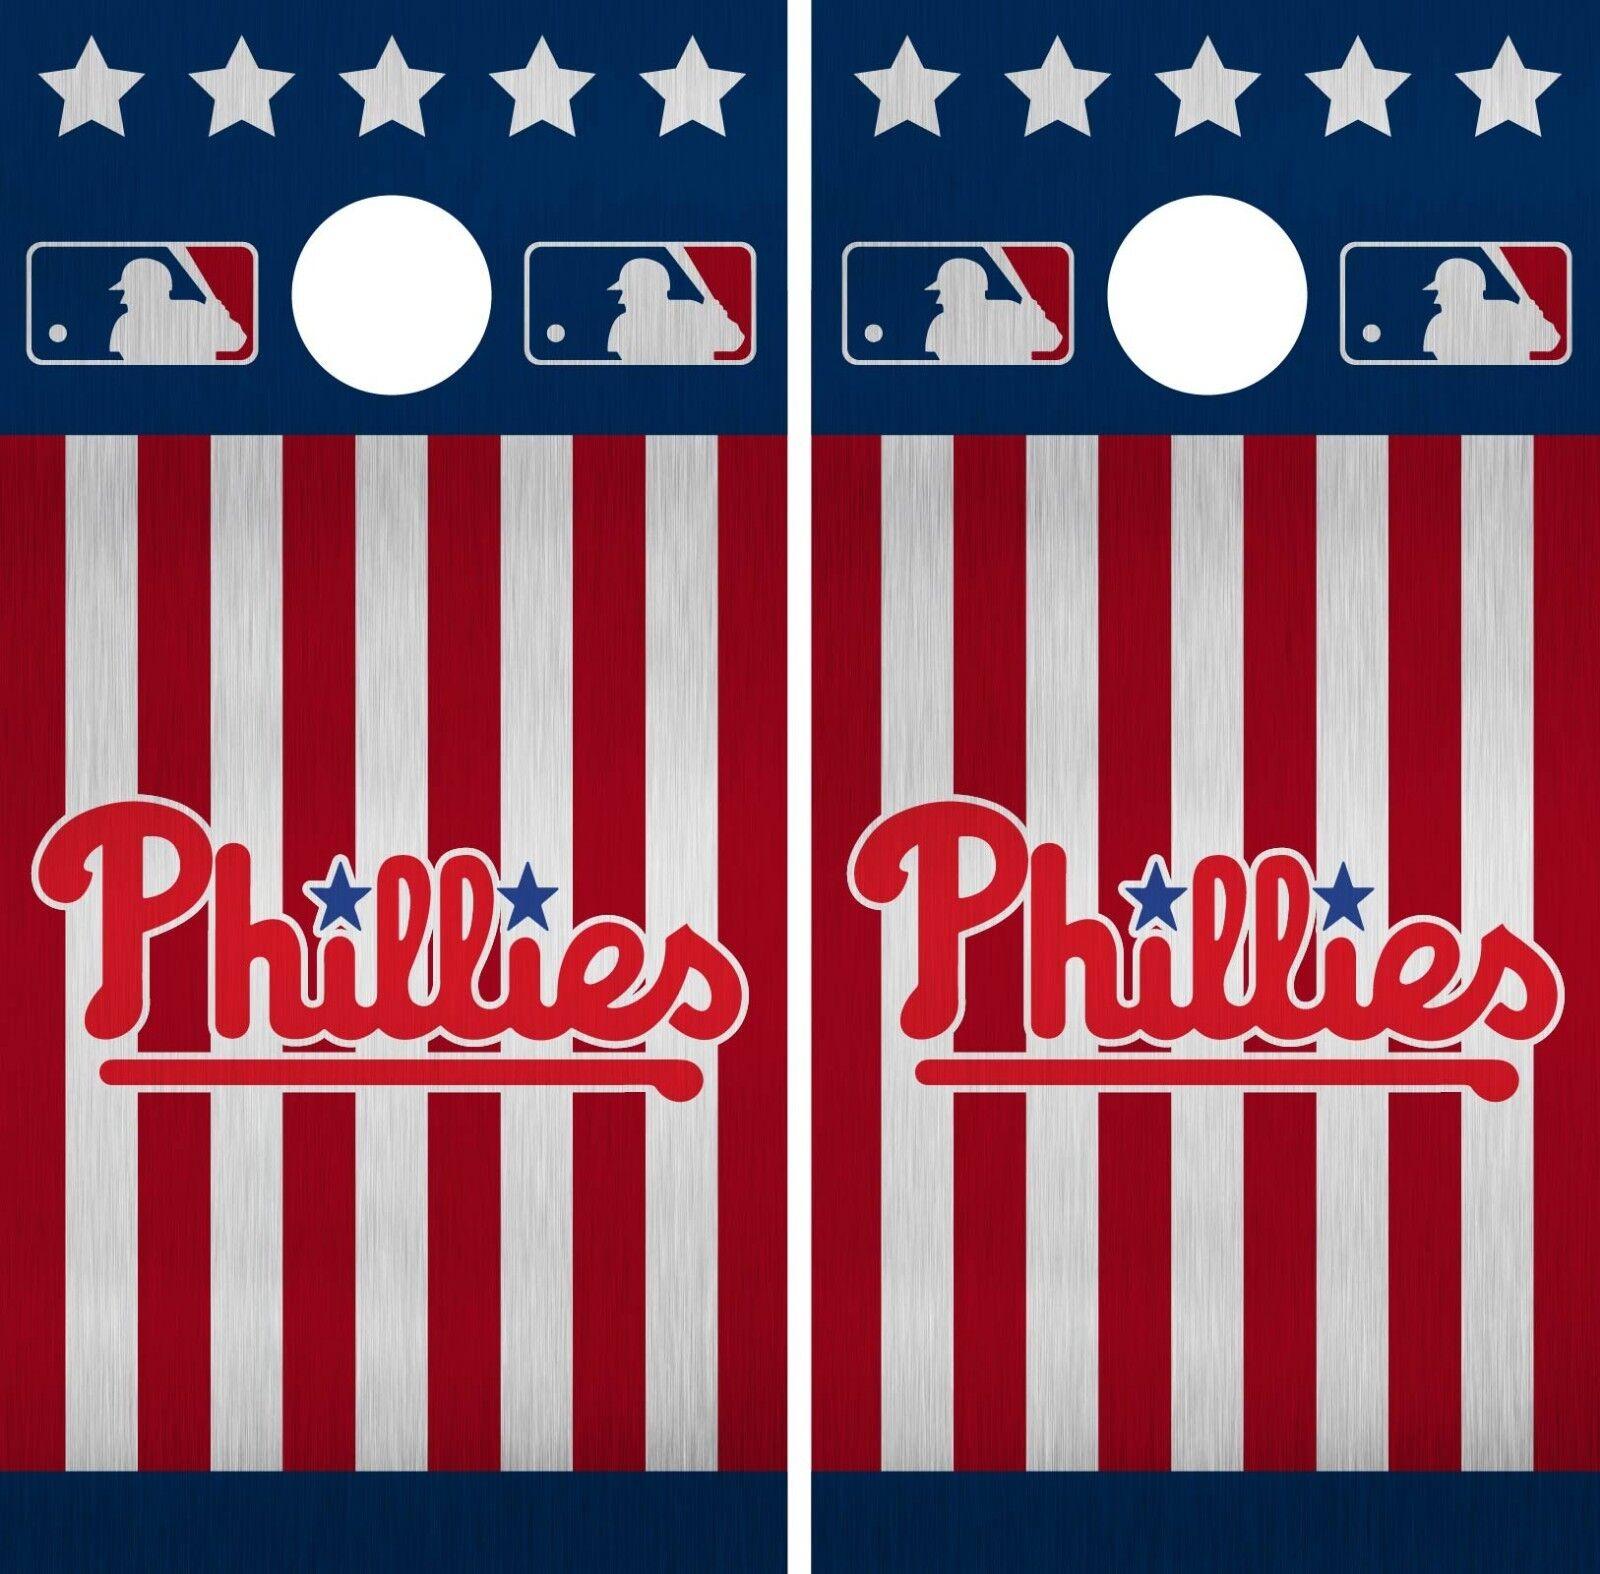 Philadelphia Phillies Cornhole Wrap MLB America Game Skin Set Vinyl Decal CO509